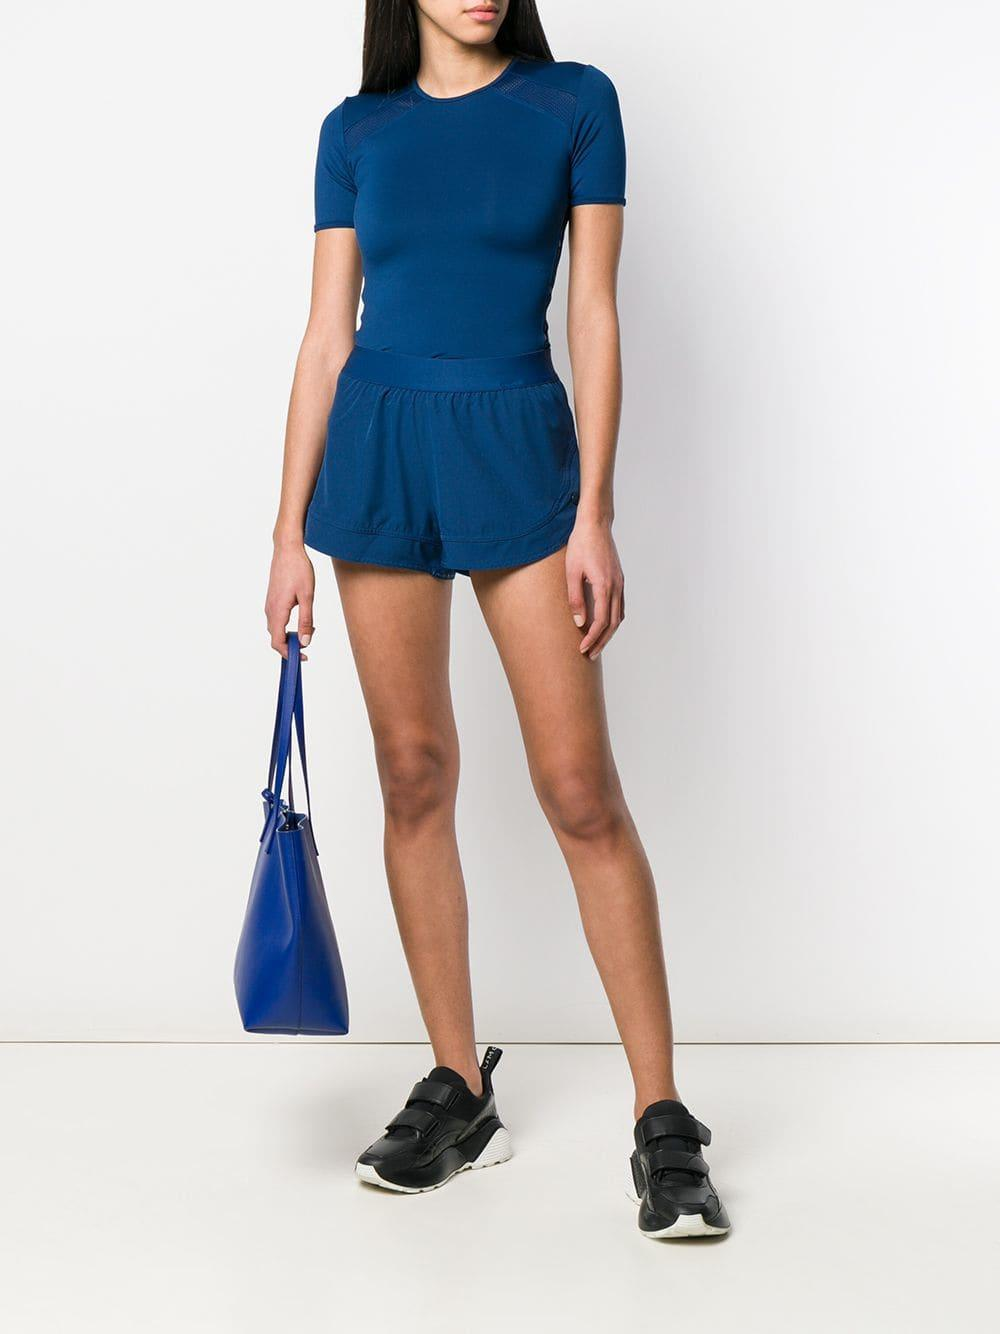 a356bd3c34d2 Adidas By Stella McCartney - Blue Running Shorts - Lyst. View fullscreen